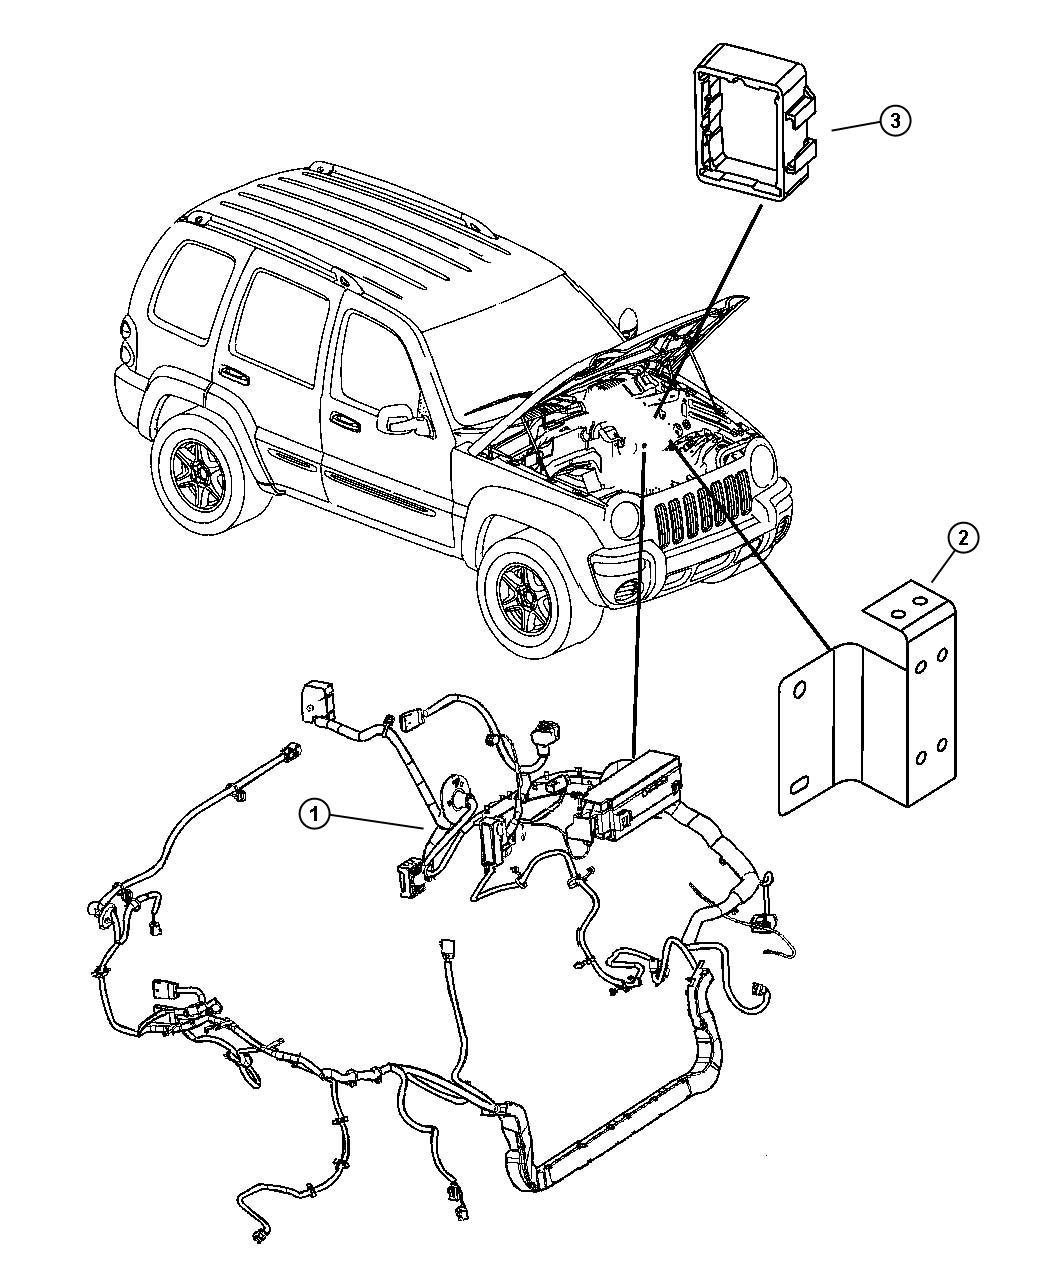 Jeep Liberty Wiring Headlamp To Dash Security